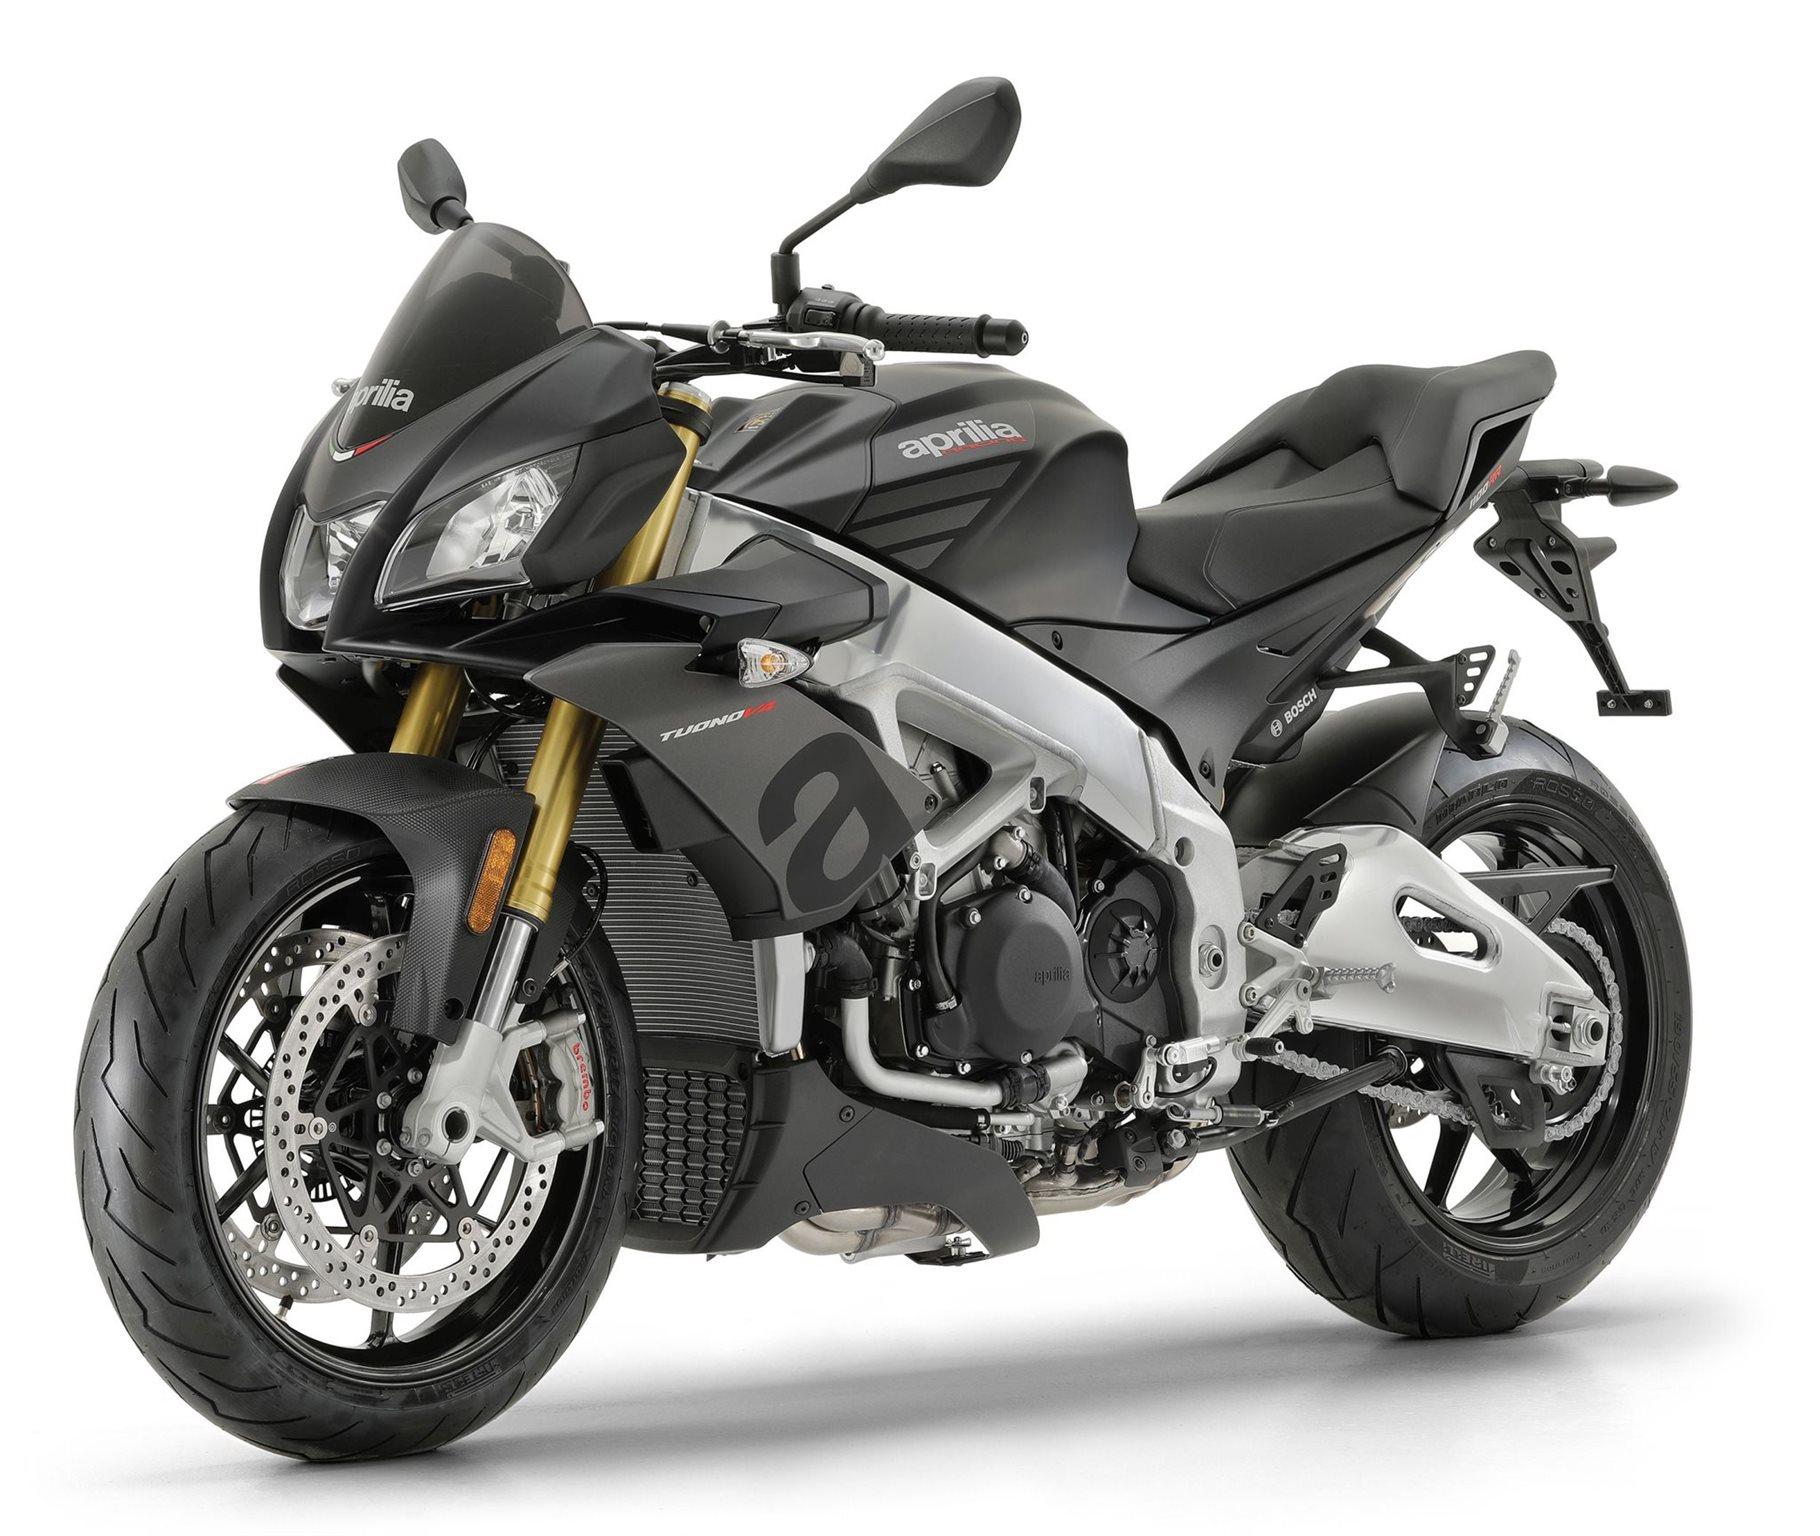 Aprilia Tuono V4 1100 RR Motorrad, neu